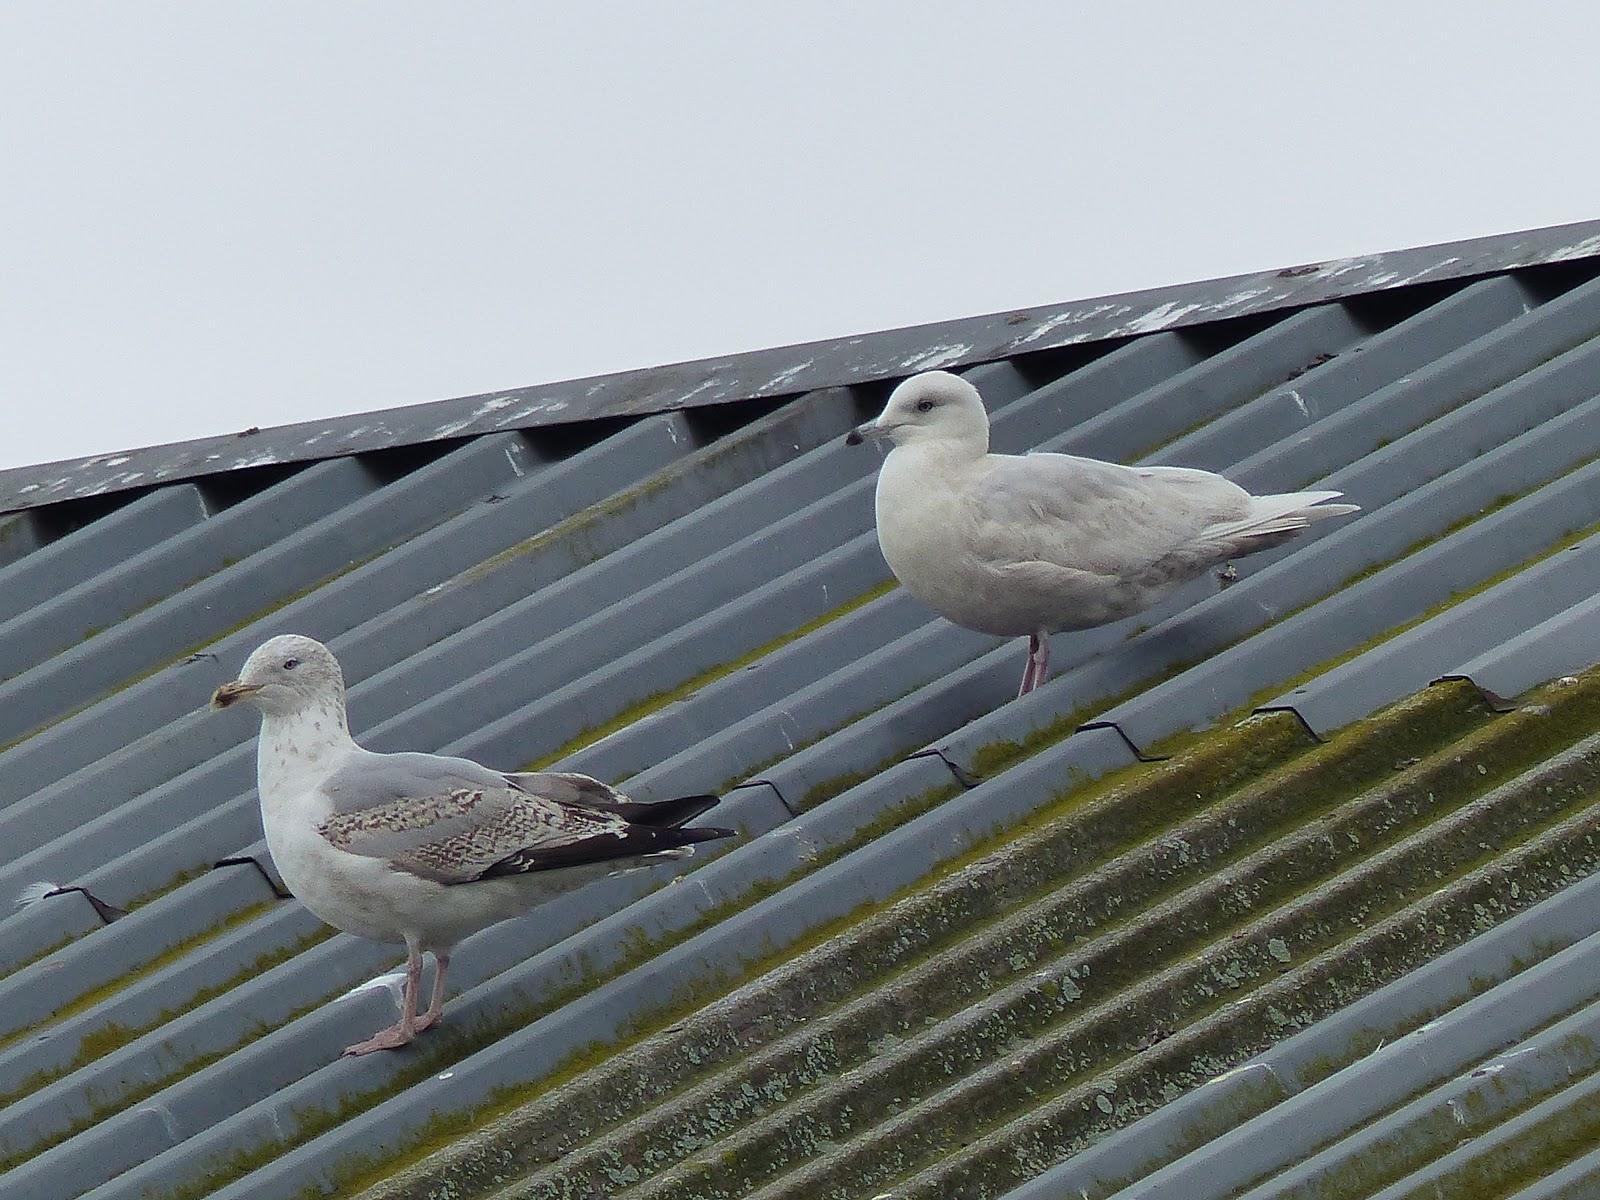 Sheffield bird study group